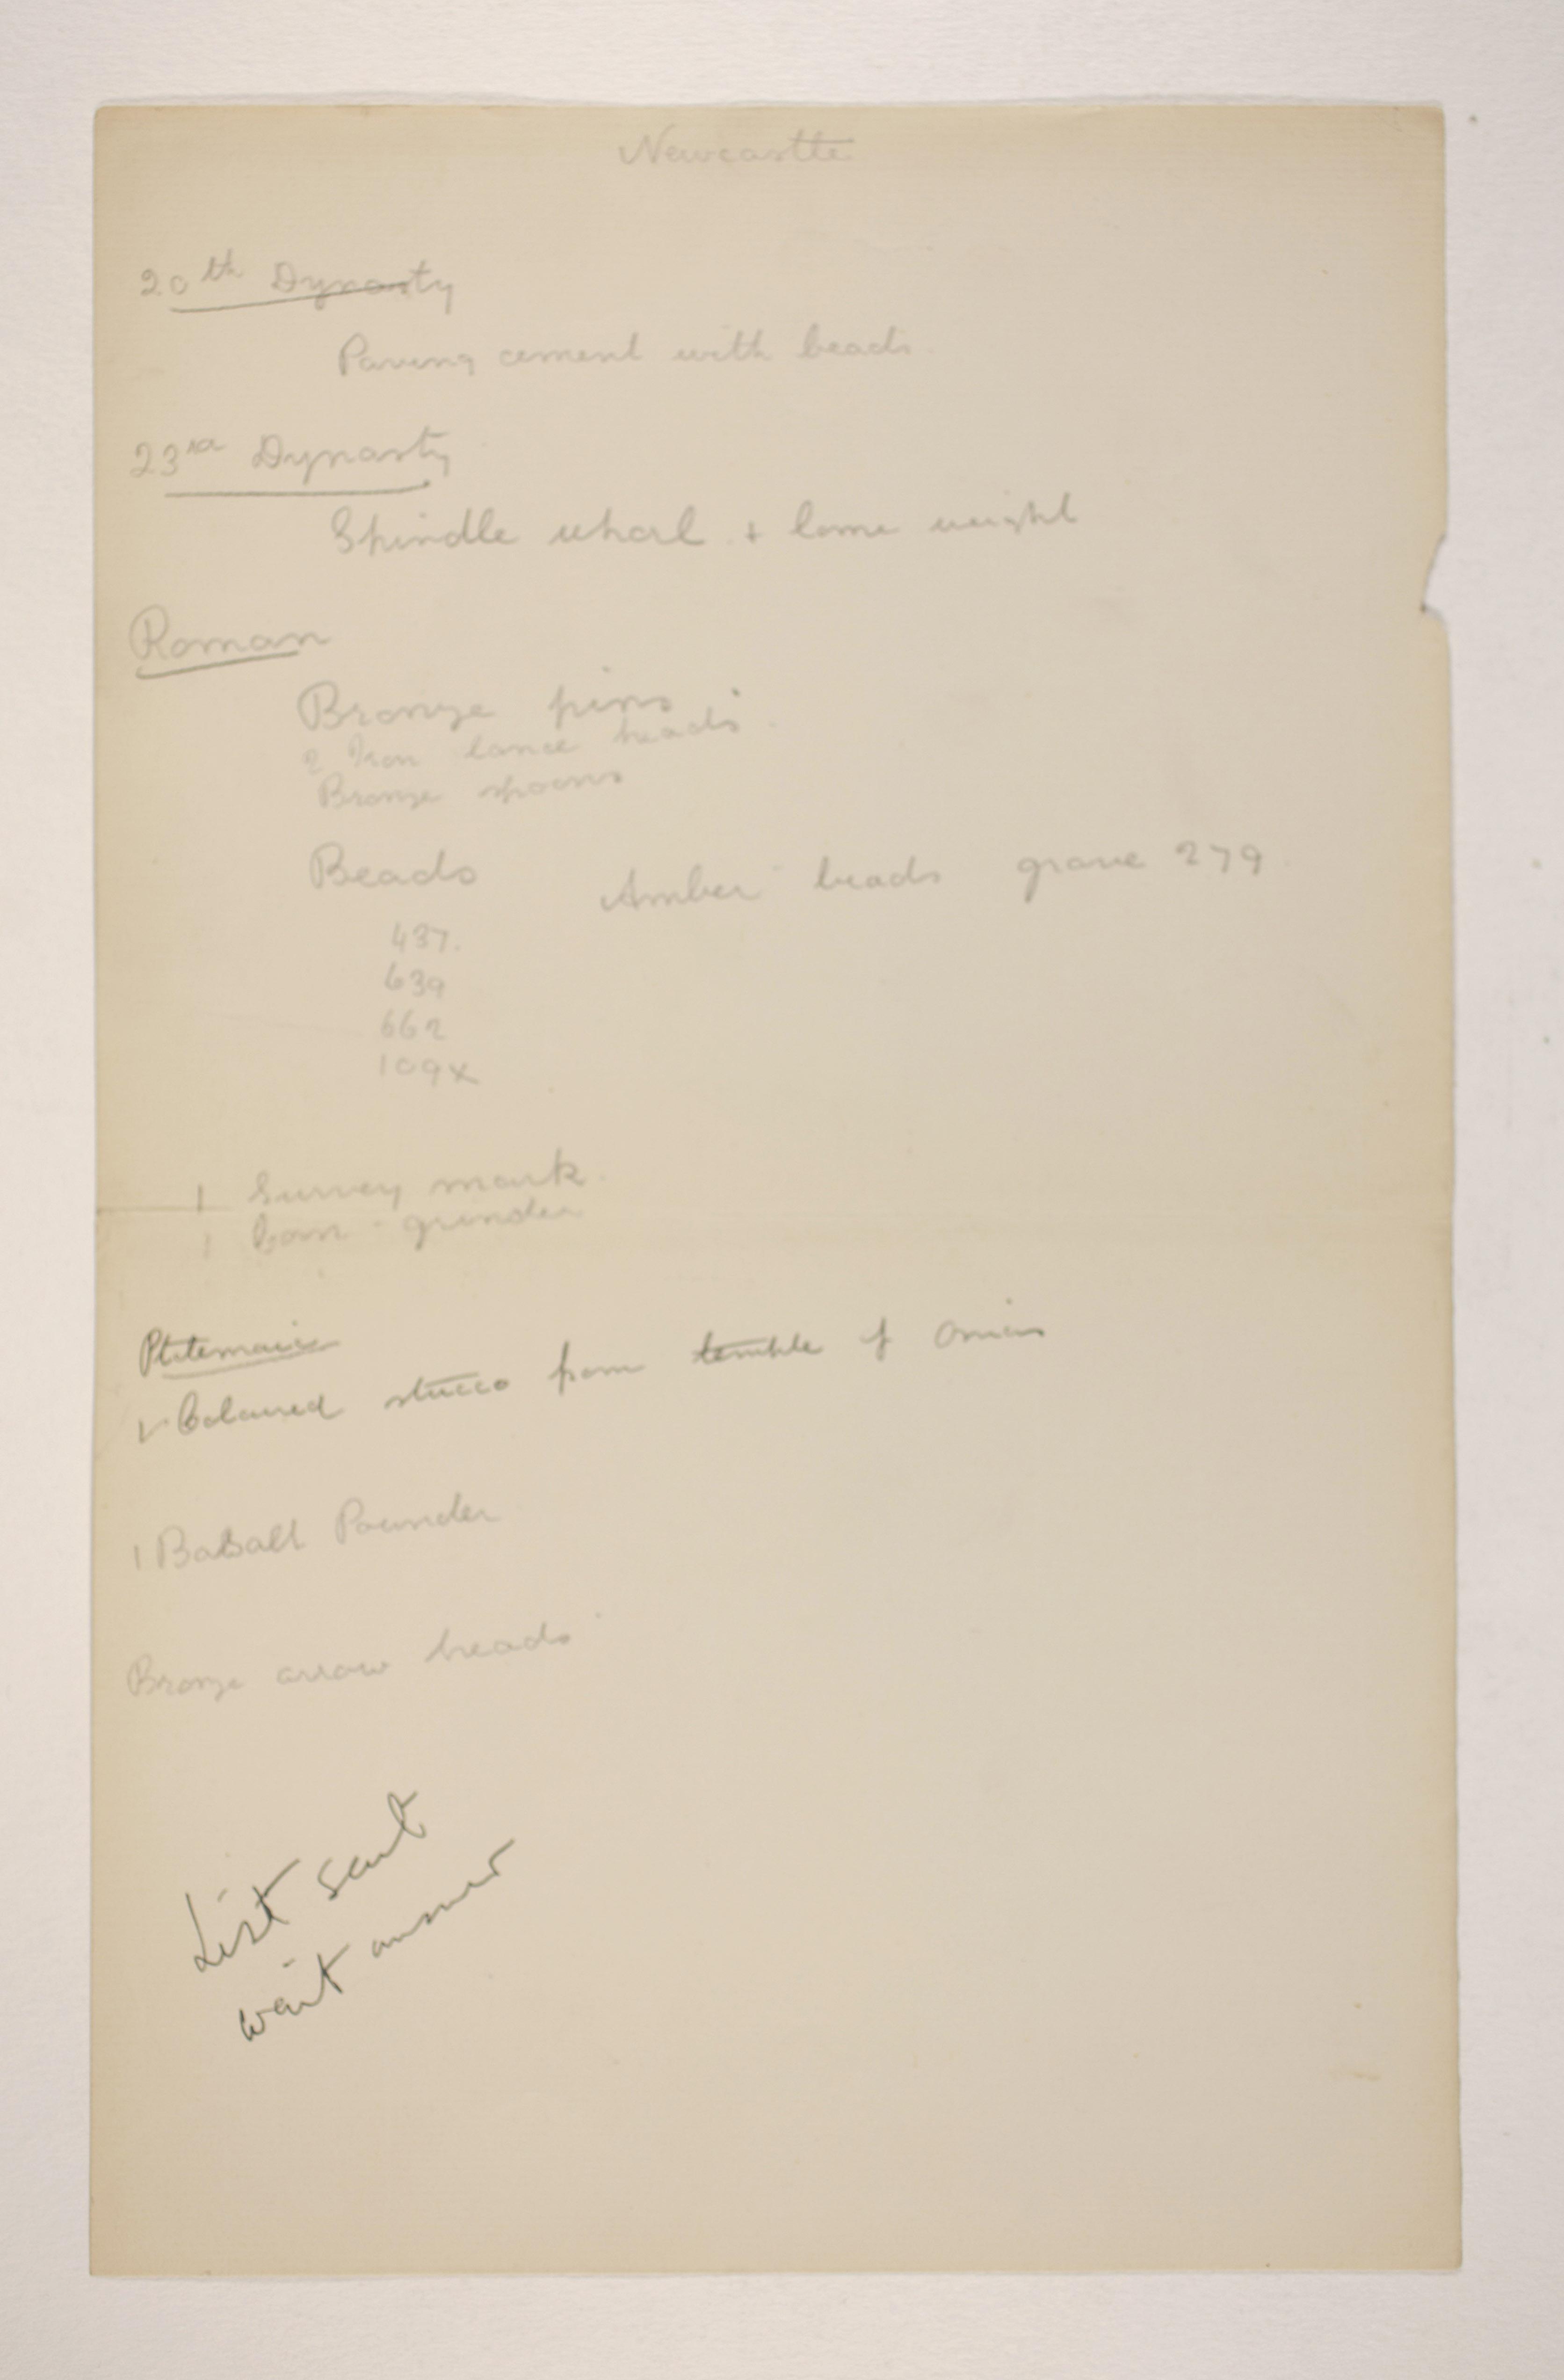 1905-06 Eastern Delta: Belbeis, Tell el-Rataba, Saft el-Hinna, Tell el-Yahudiya, Shaghanbeh, Ghita Individual institution list  PMA/WFP1/D/14/21